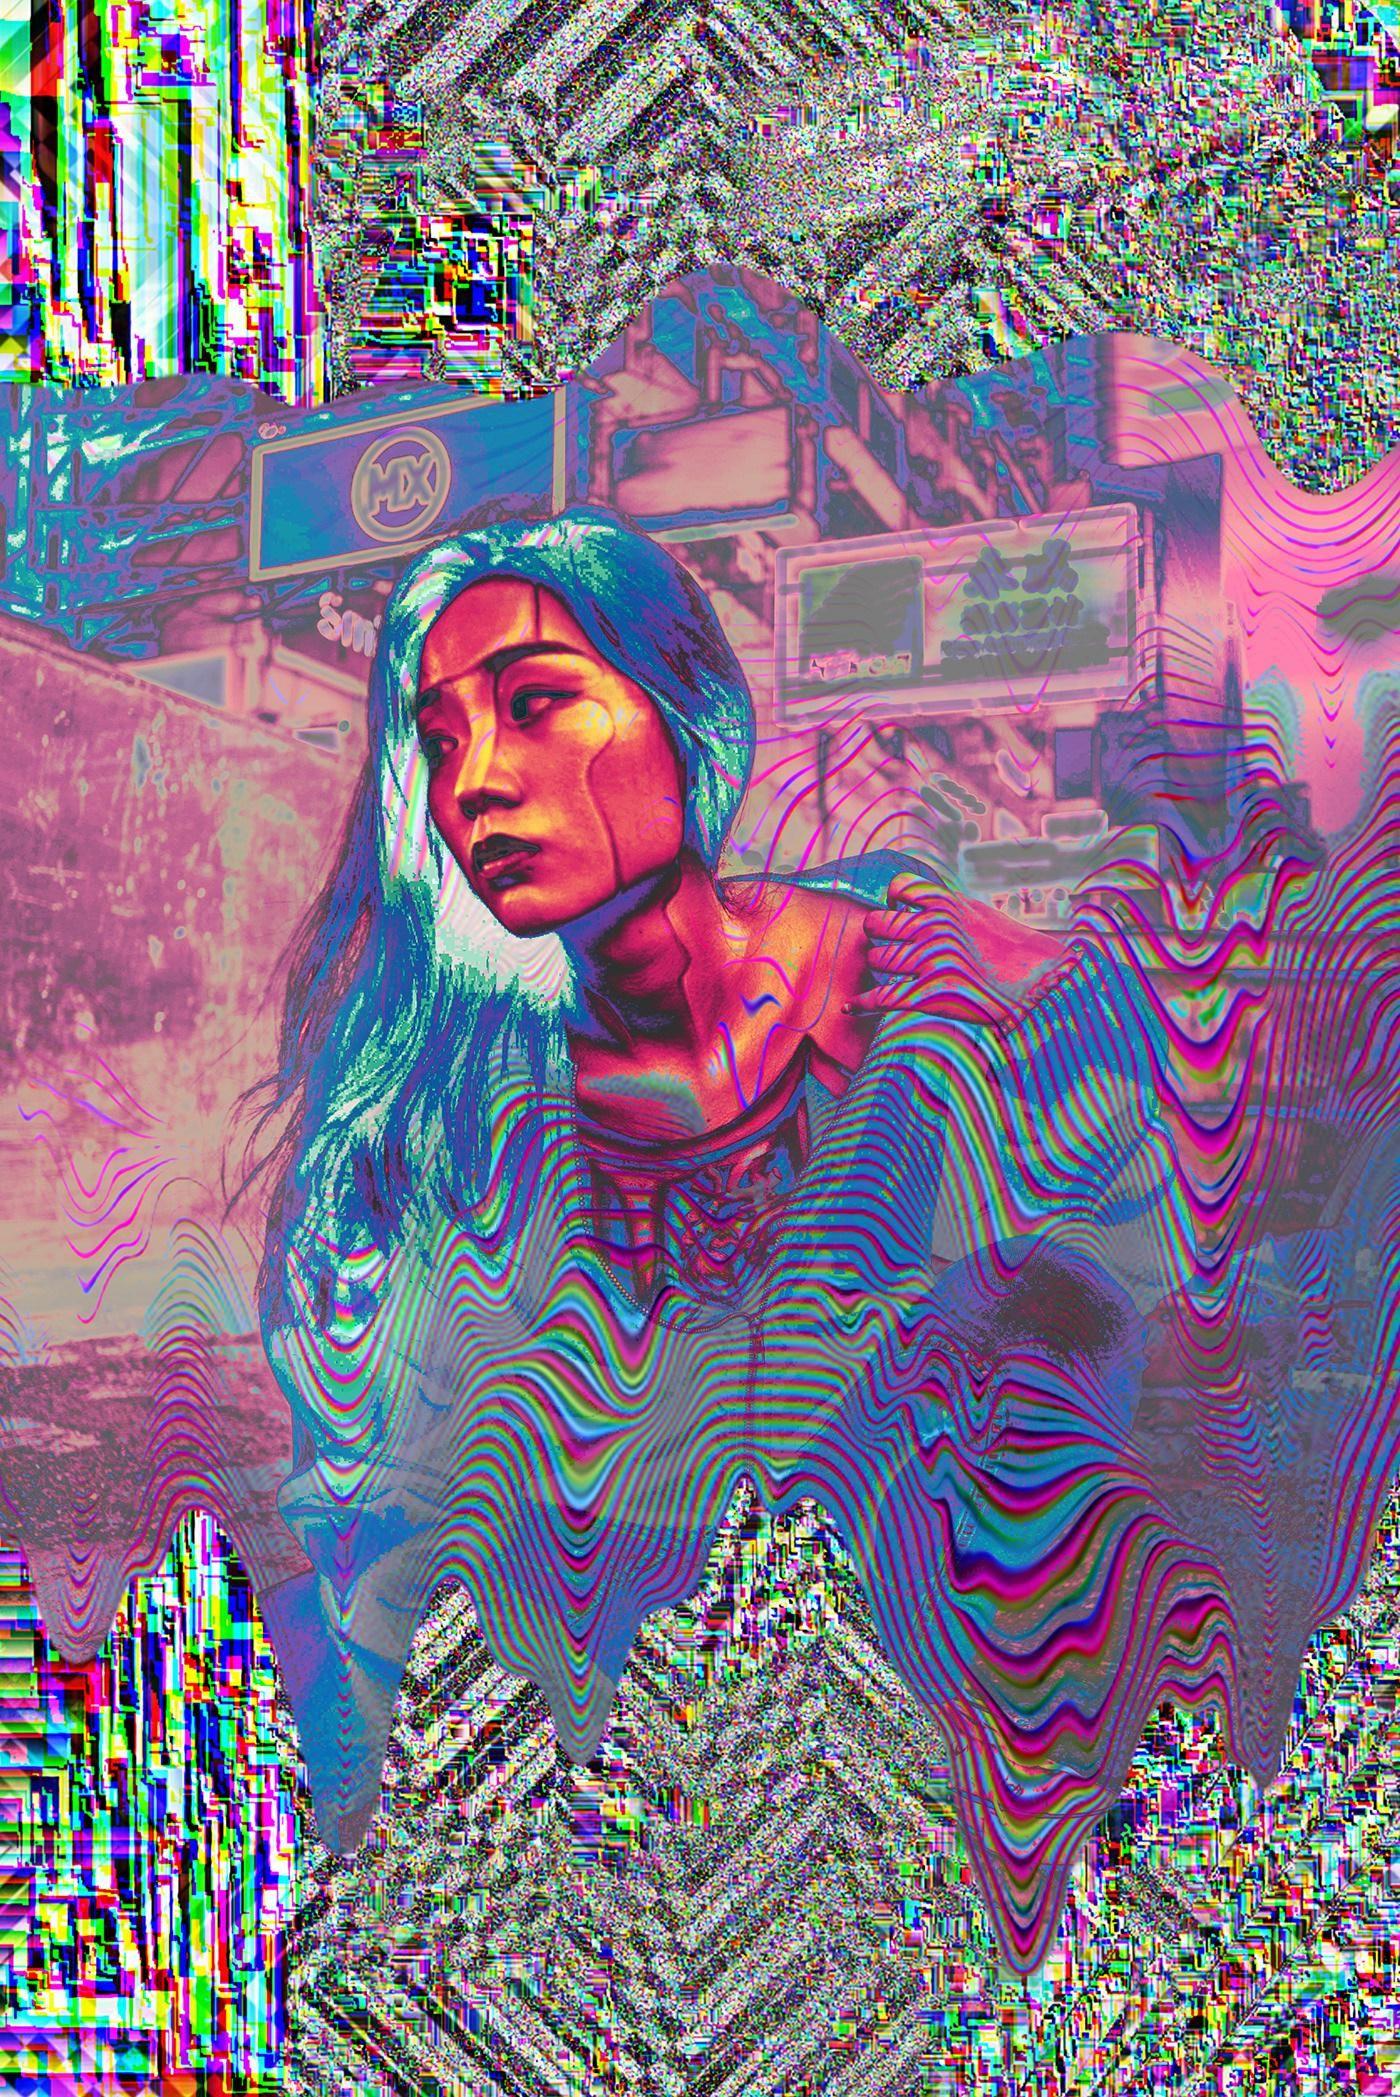 Cyberpunk Gen 3.1/// Glitch (With images